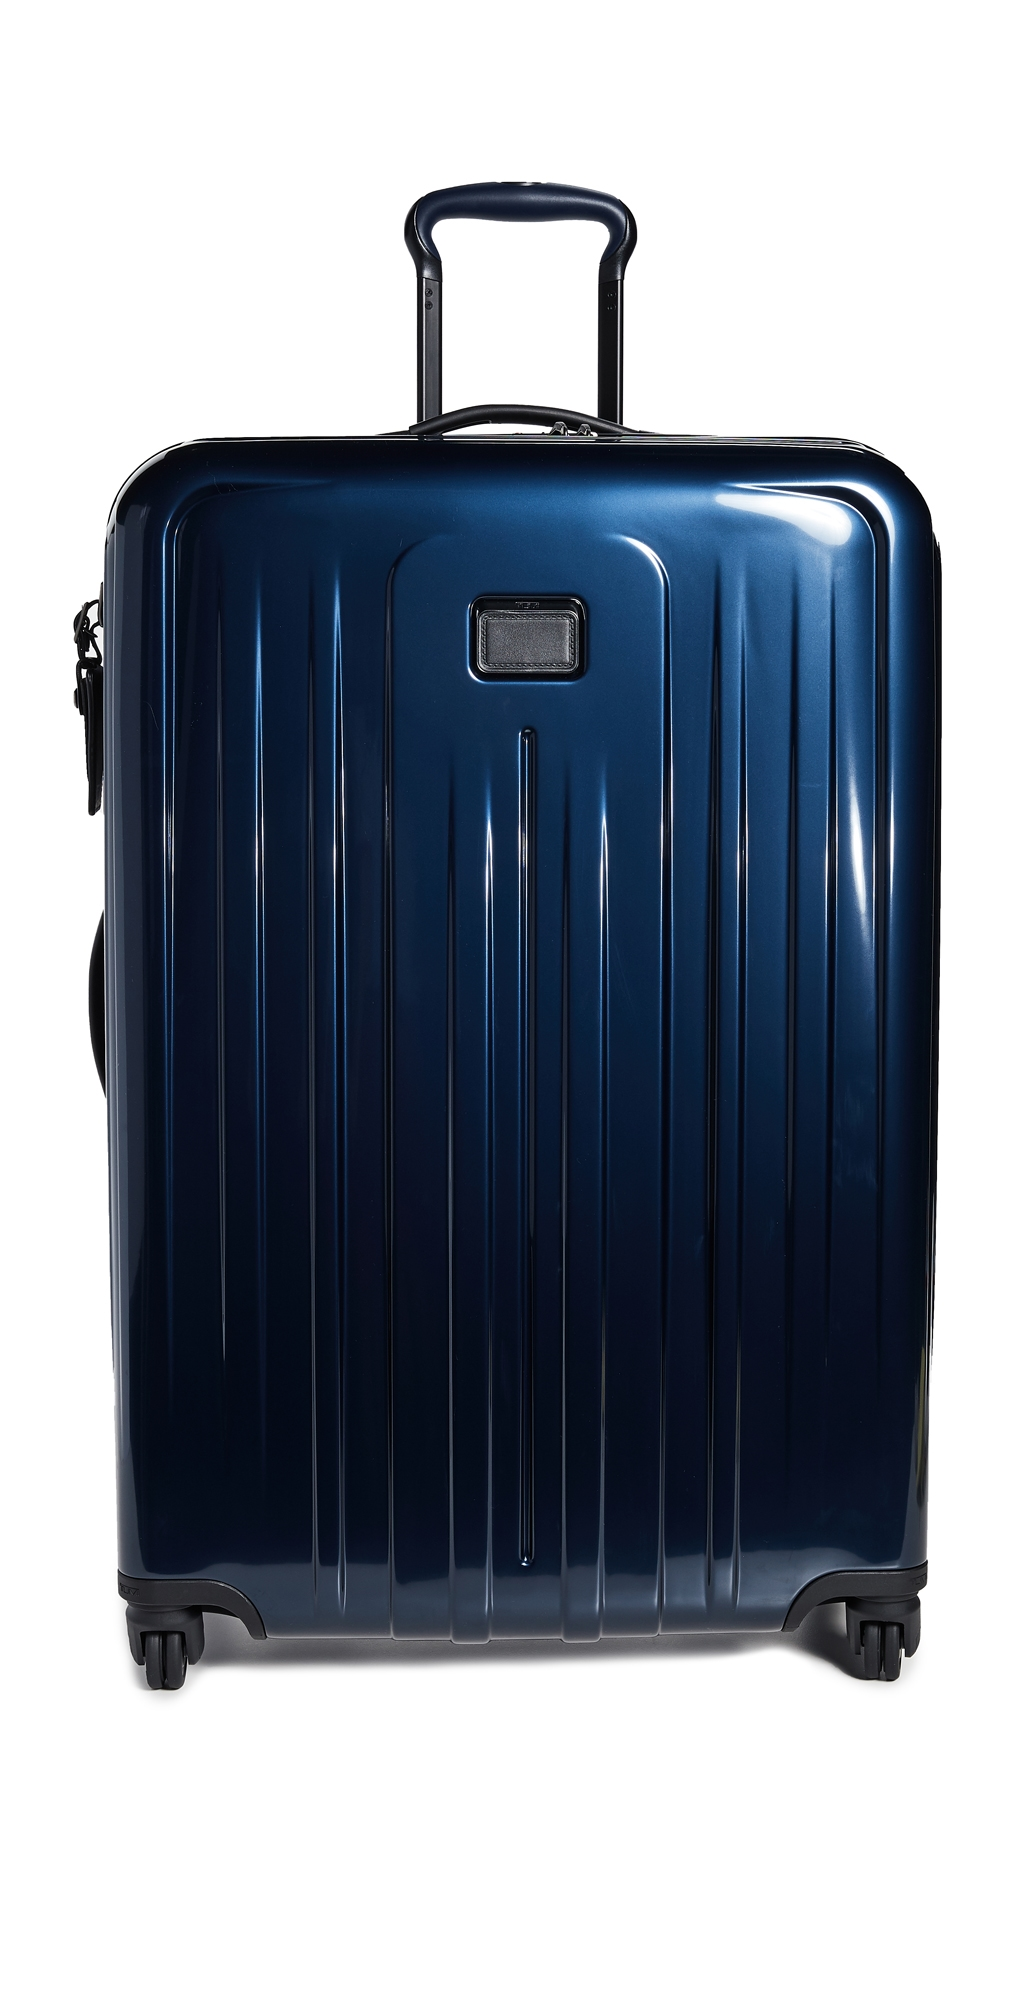 Tumi V4 Extended Trip Expandable 4 Wheel Suitcase